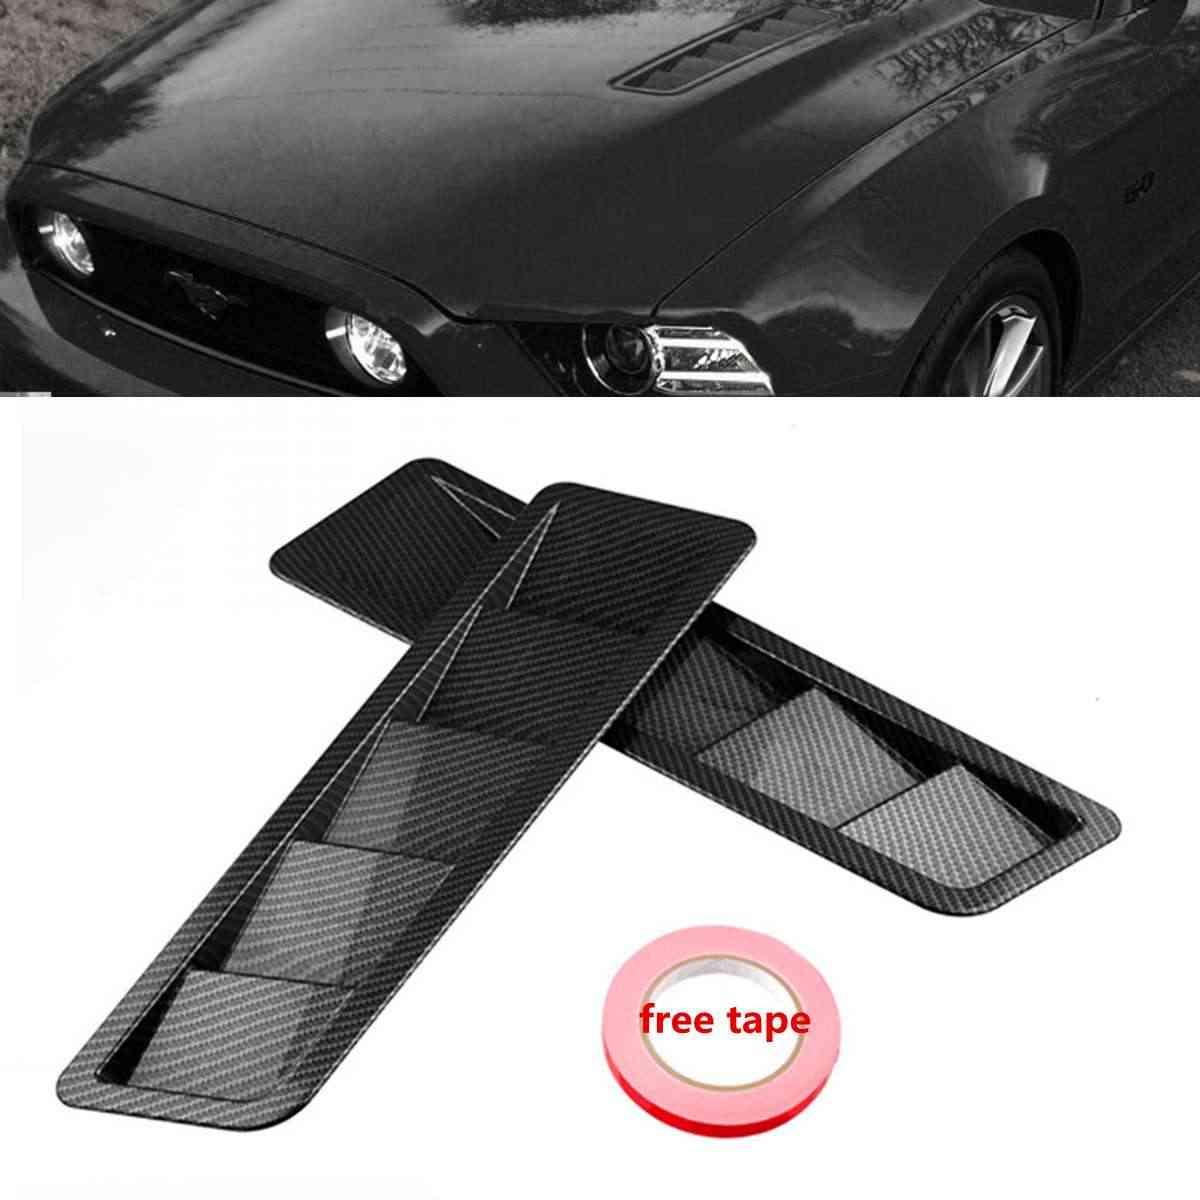 Universal Hood Louvers Air Flow Vent Cover Intake Hood Scoop 2pcs//set Leather Look Black